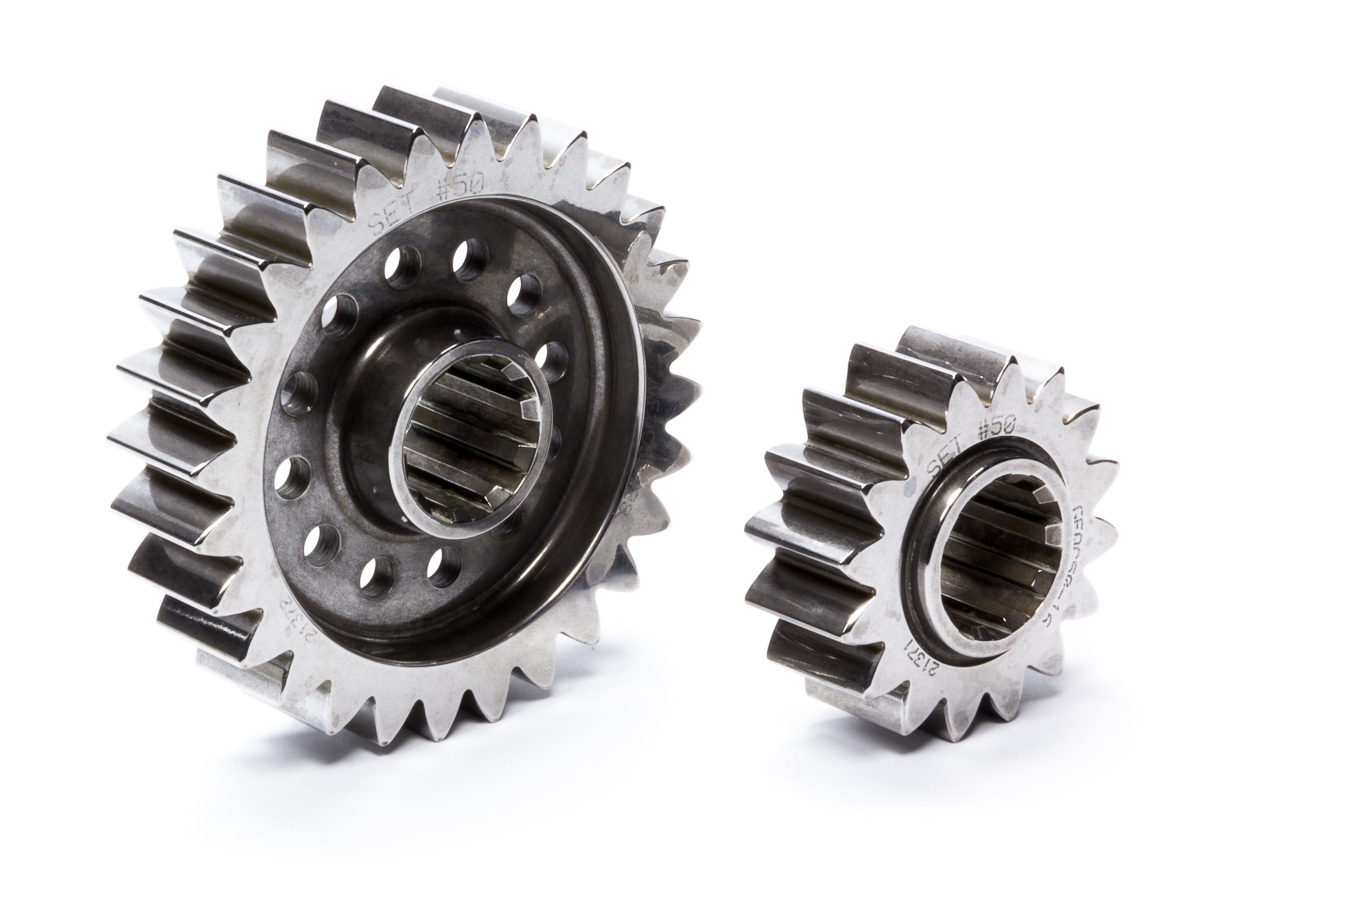 Diversified Machine FFQCG-50 Quick Change Gear Set, Friction Fighter, Set 50, 10 Spline, 4.12 Ratios 7.21 / 2.35, 4.86 Ratios 8.50 / 2.78, Steel, Each